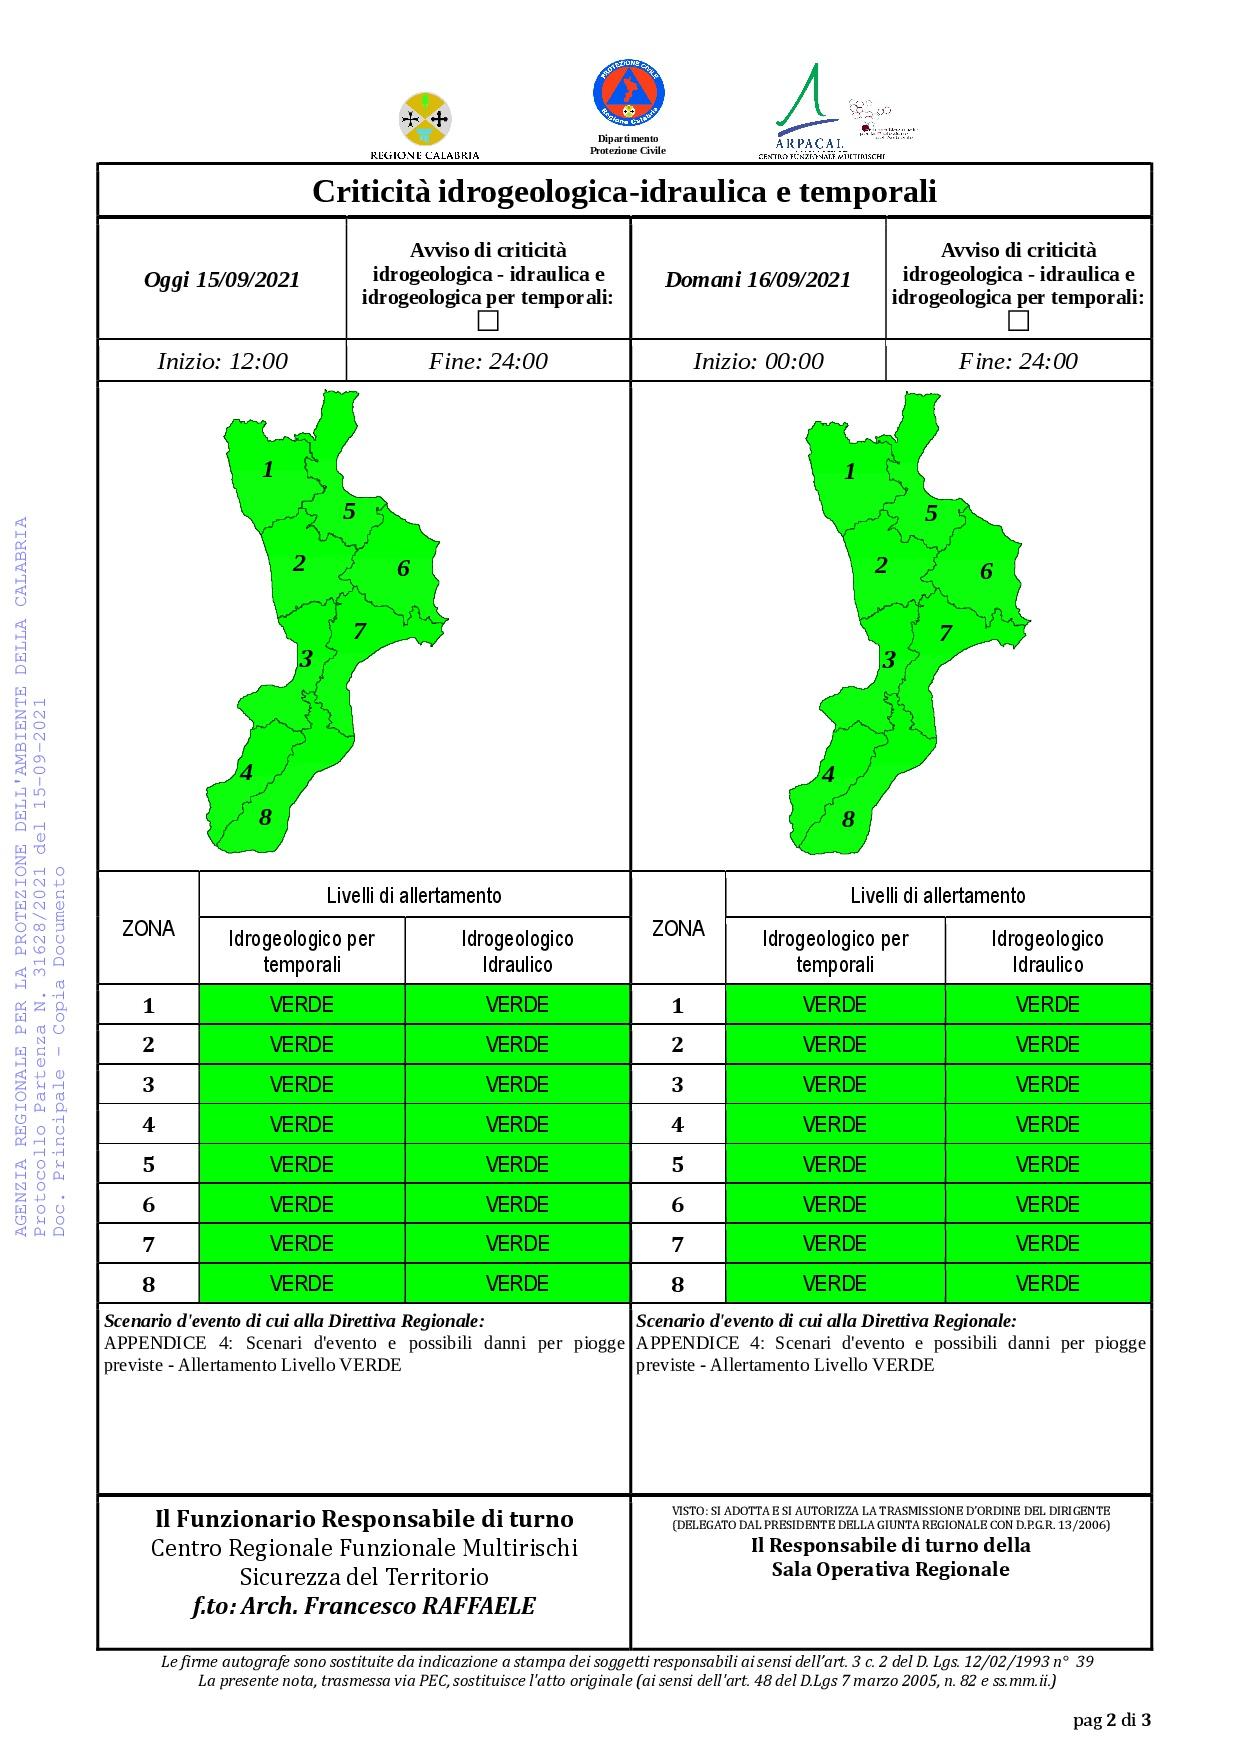 Criticità idrogeologica-idraulica e temporali in Calabria 15-09-2021